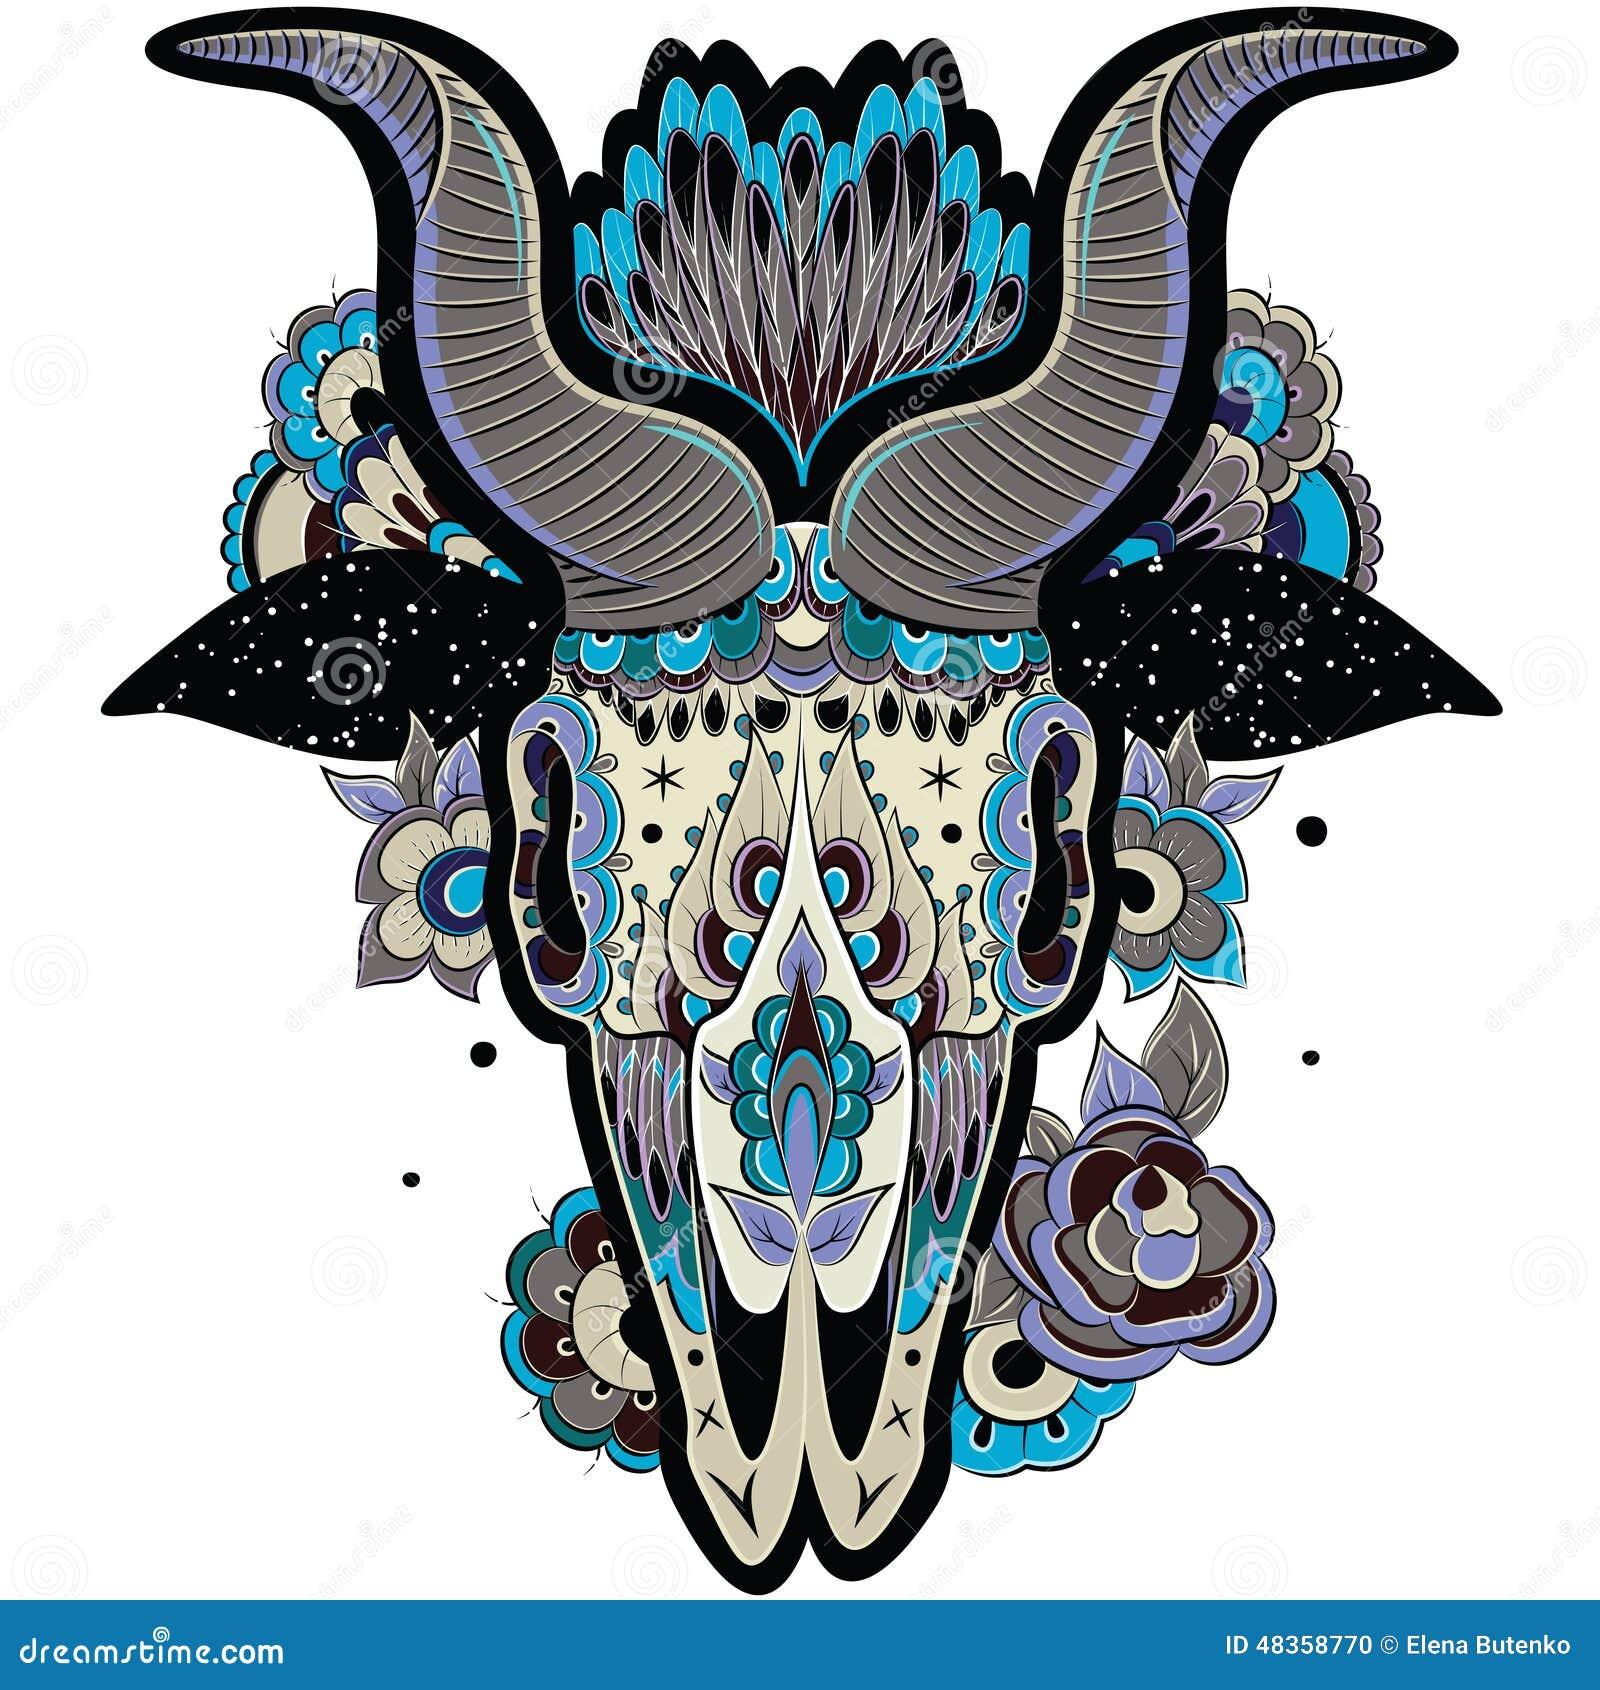 Cool Goat Skull Stock Photo - Image: 48358770